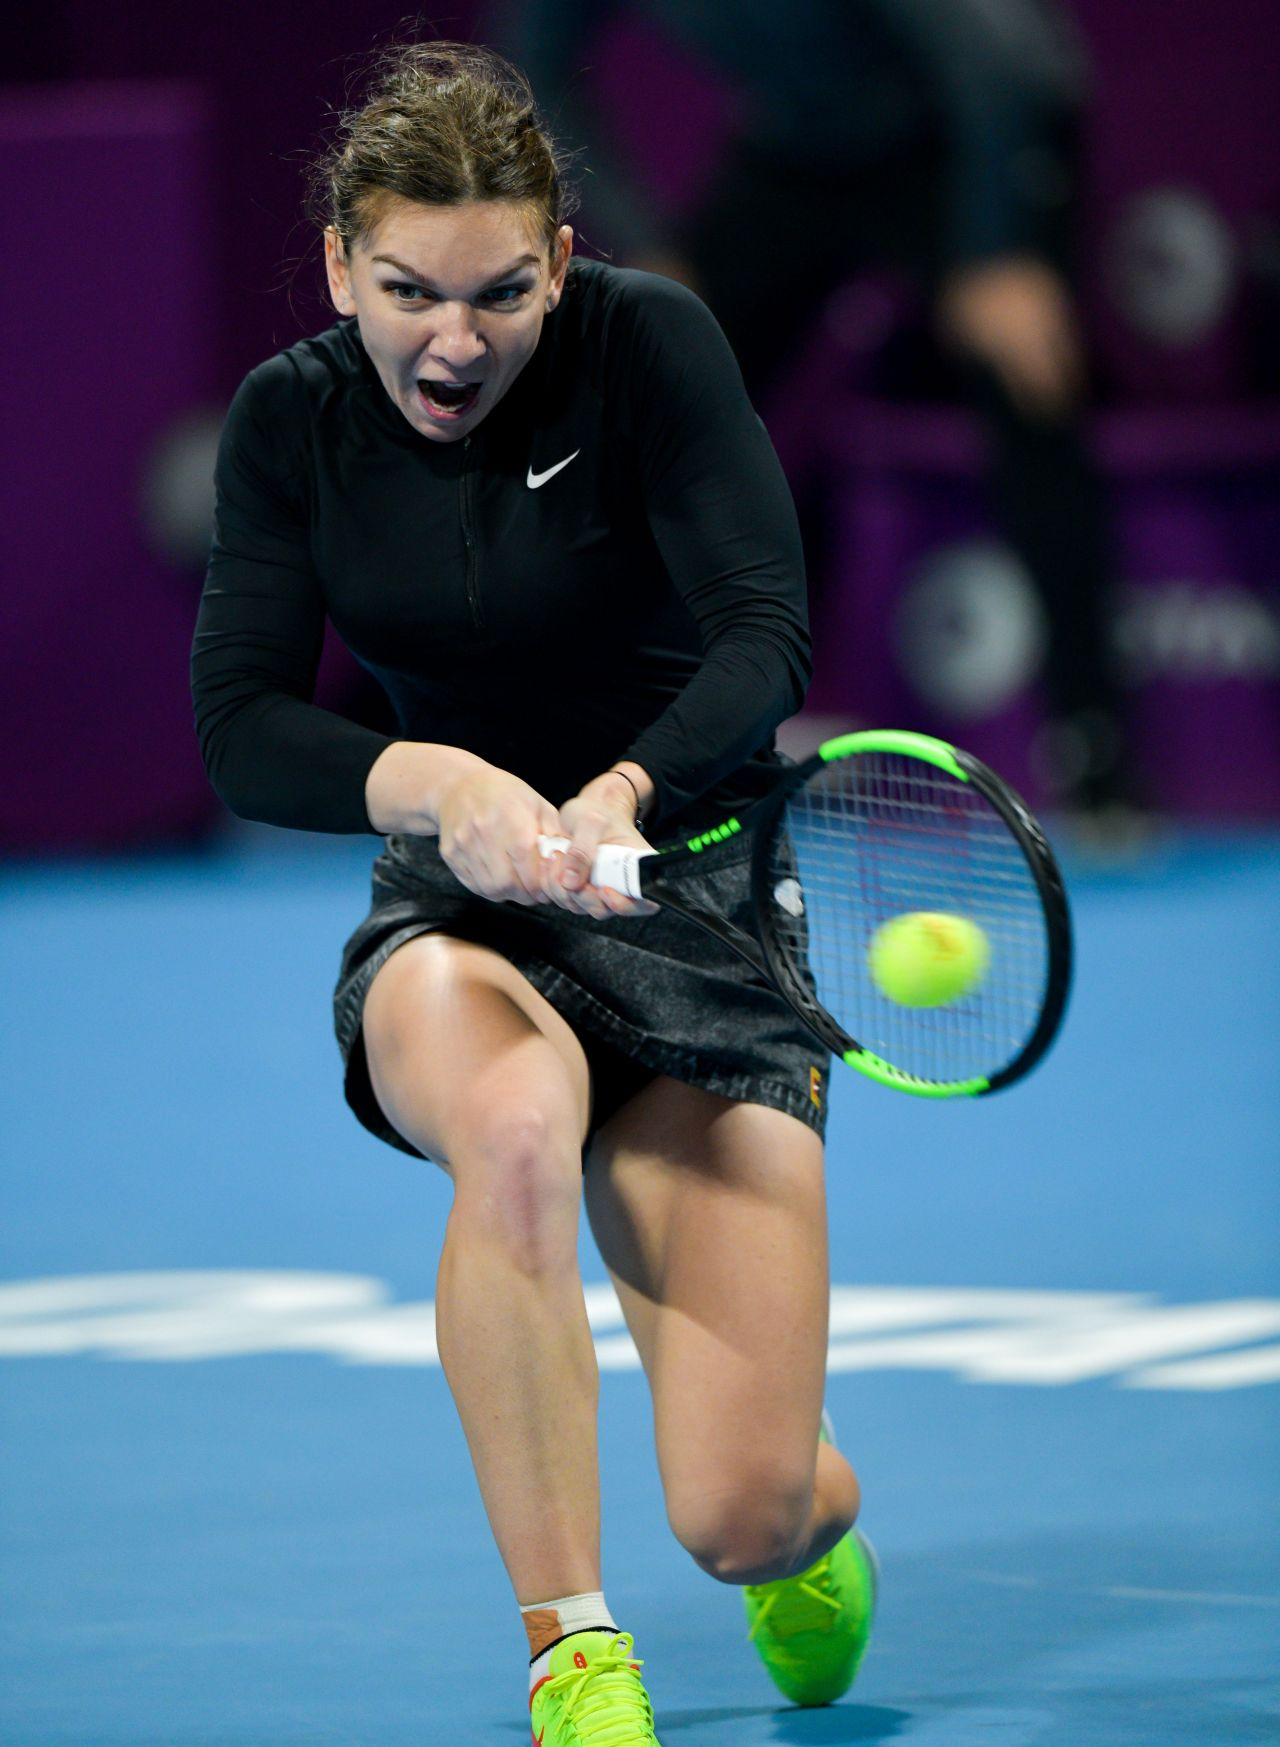 Simona Halep – 2019 WTA Qatar Open in Doha 02/14/2019 ...